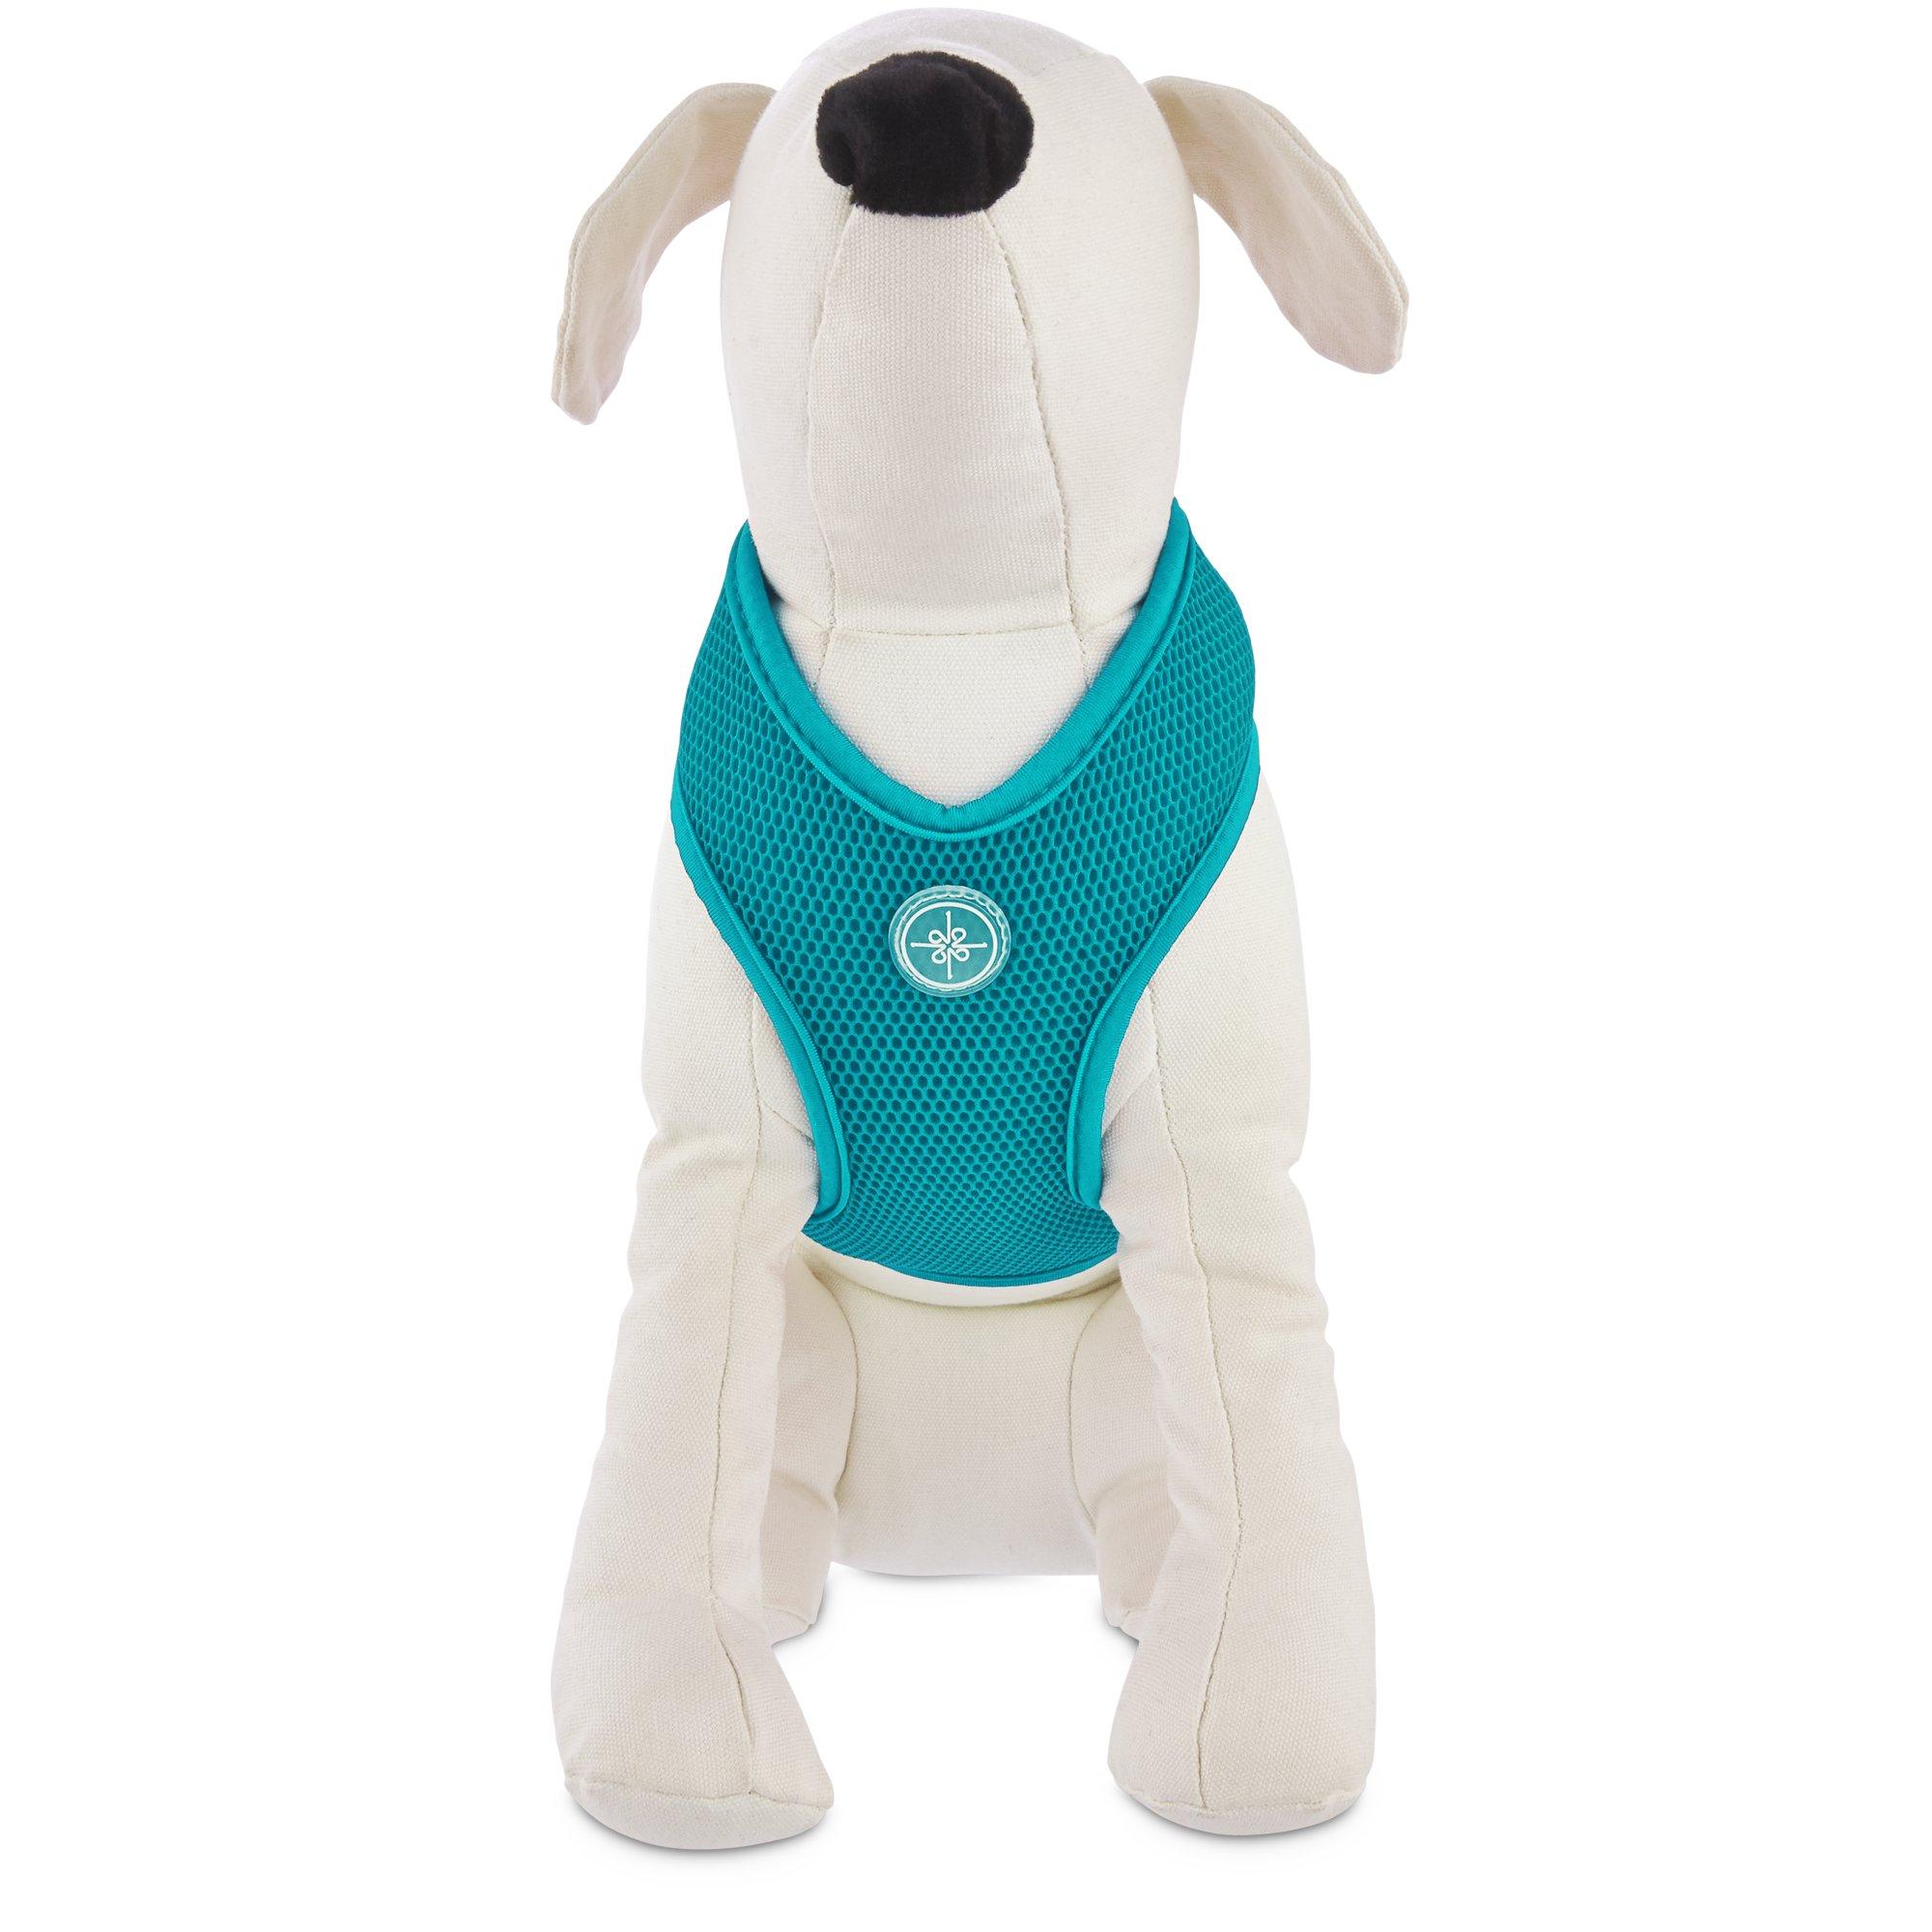 Good2Go Teal Mesh Dog Harness | Petco at Petco in Braselton, GA | Tuggl